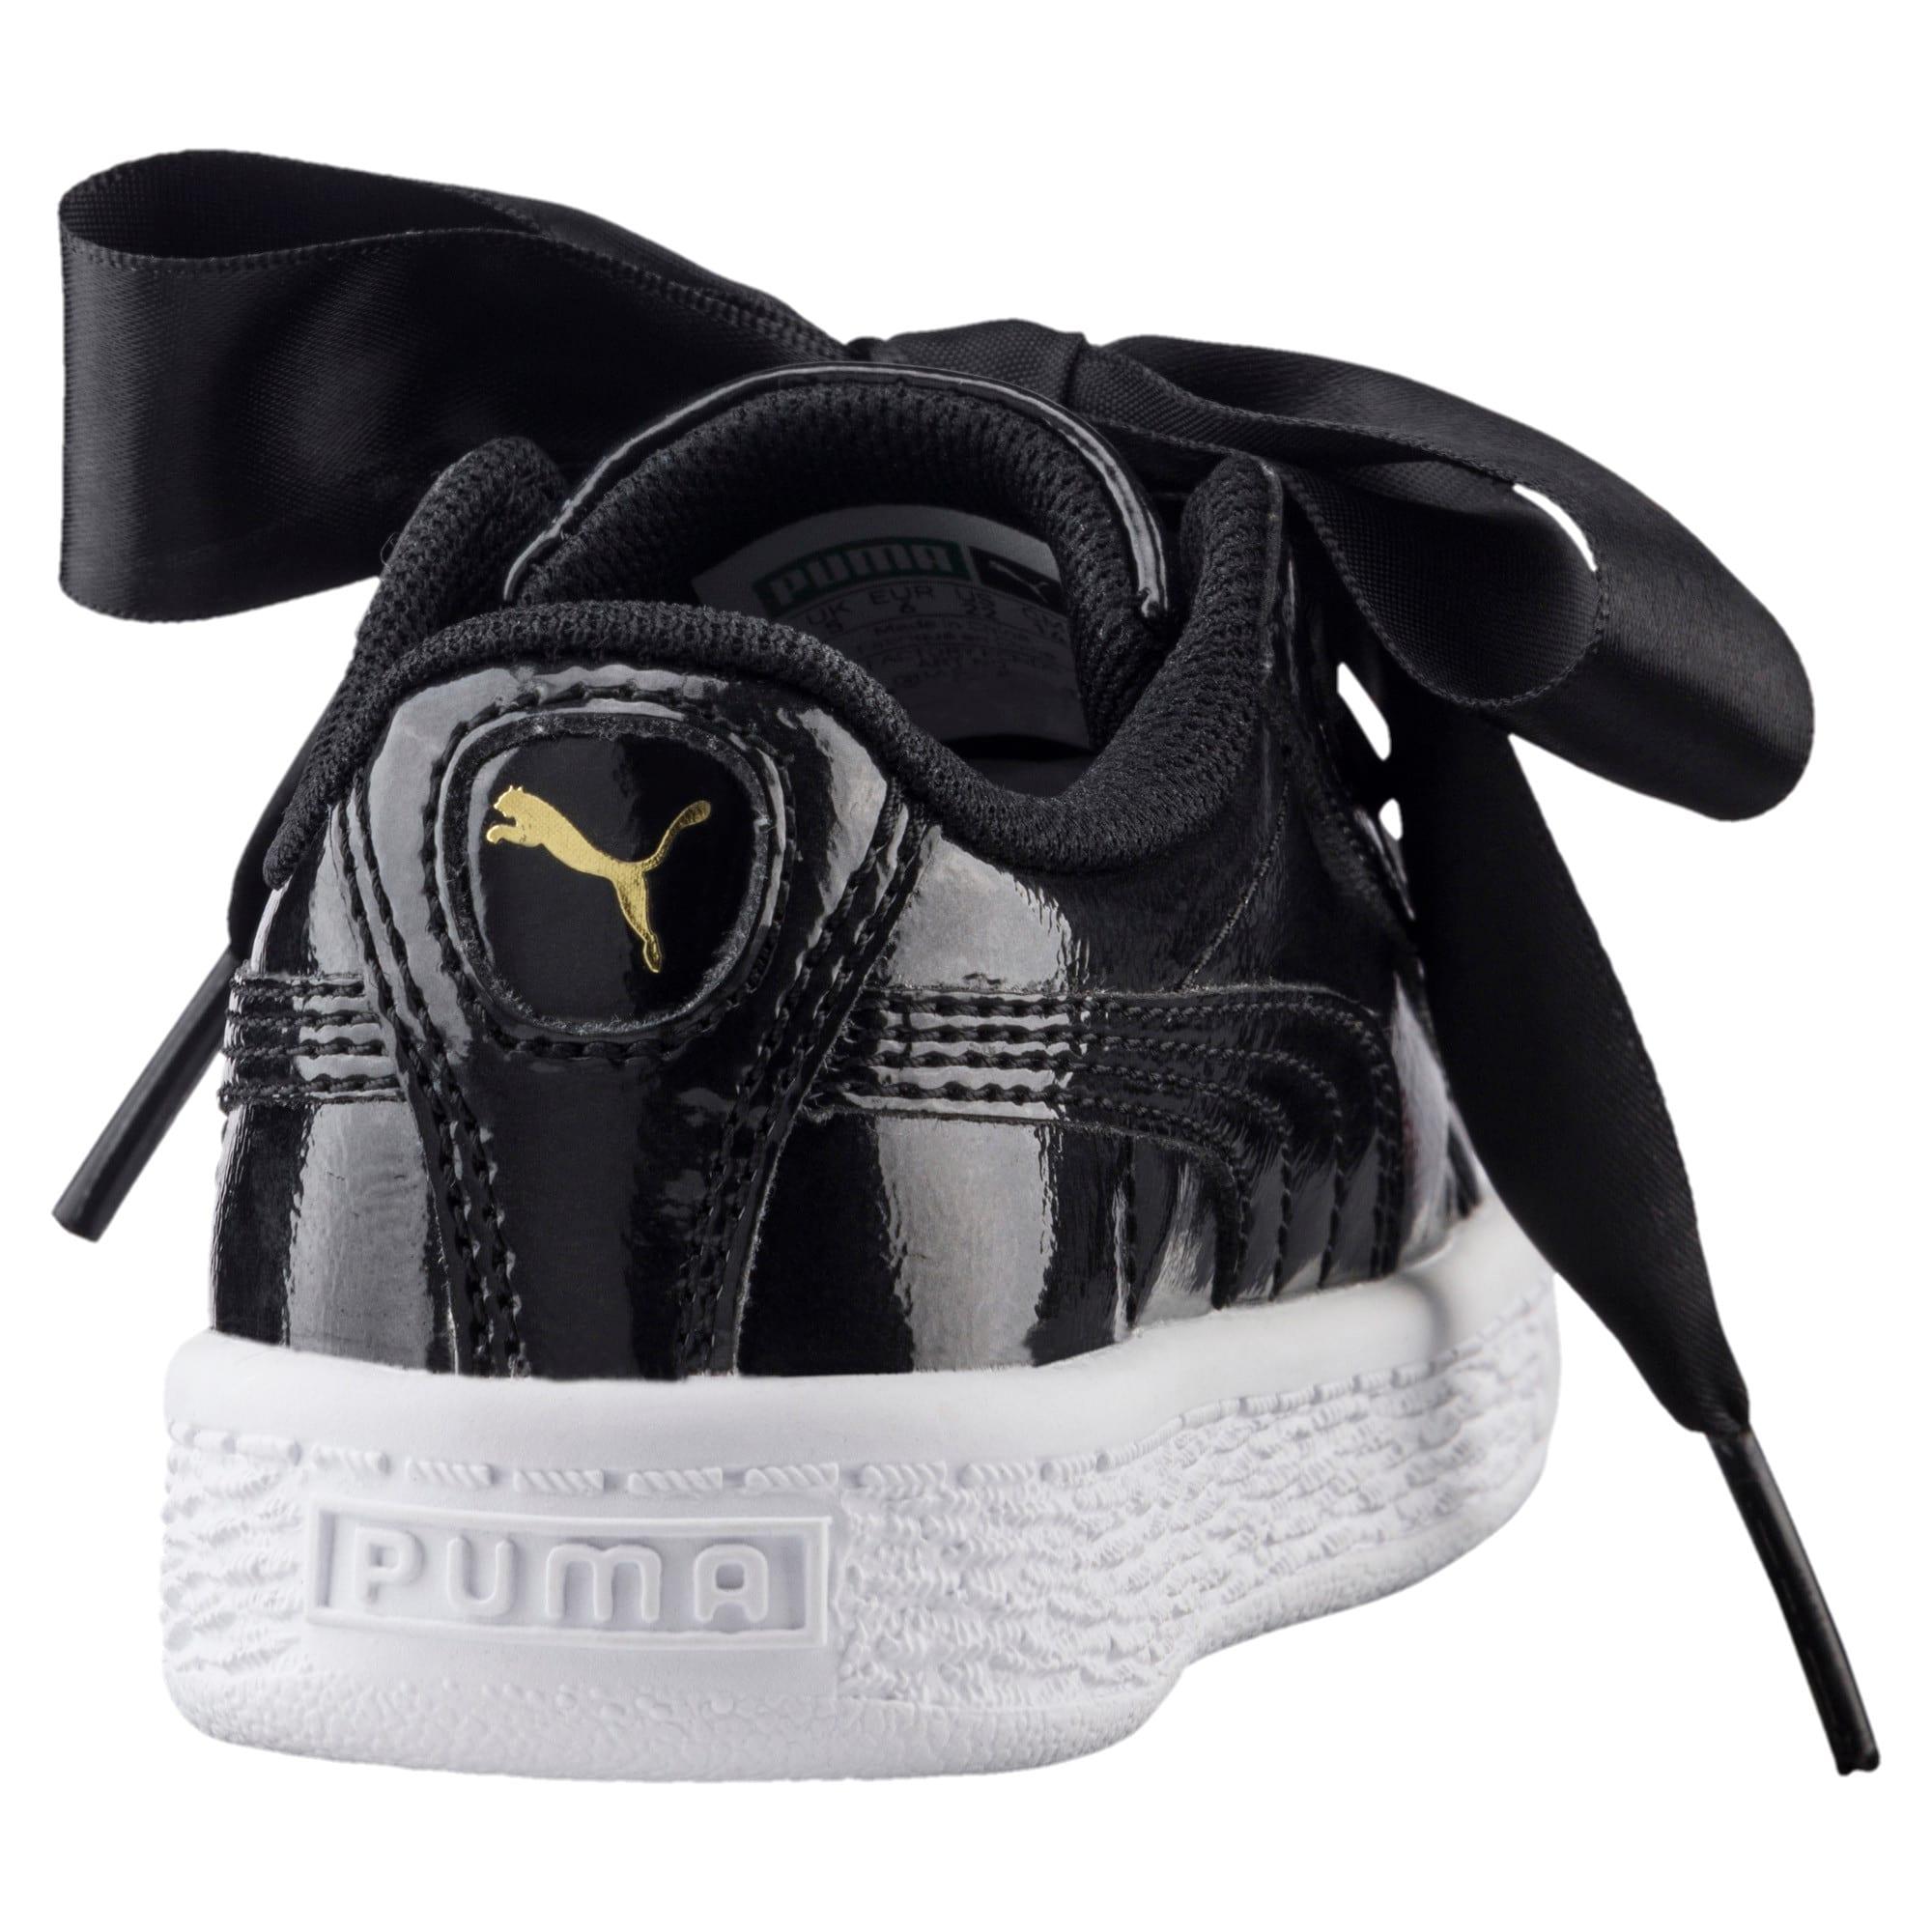 Thumbnail 4 of Basket Heart Glam Girls' Shoes, Puma Black-Puma Black, medium